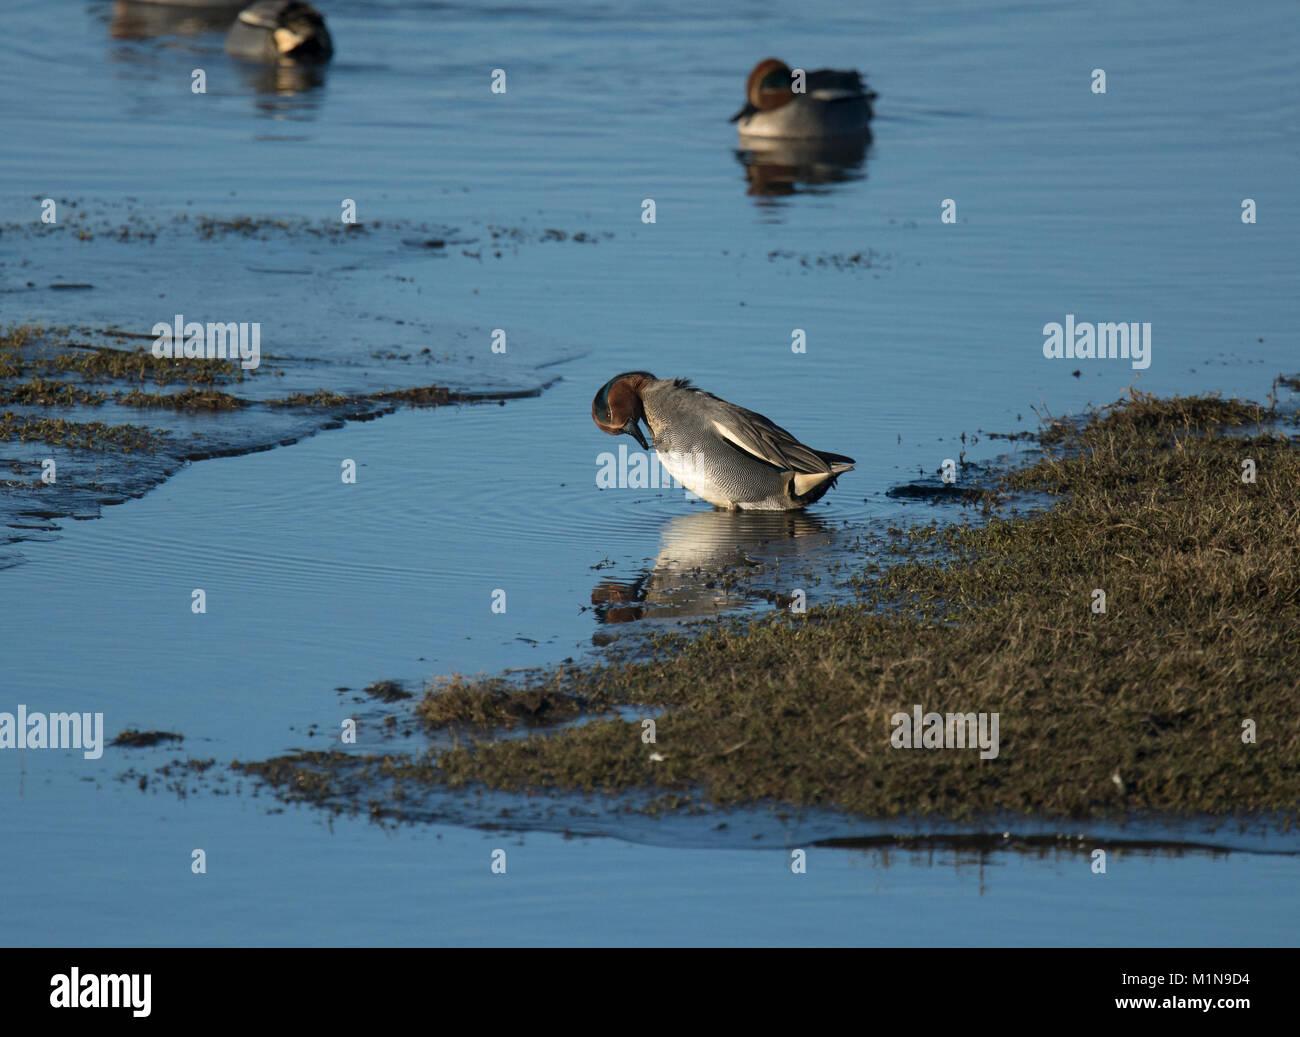 Wigeon, Anas penelope, preening, in shallow water, Lancashire, UK Stock Photo